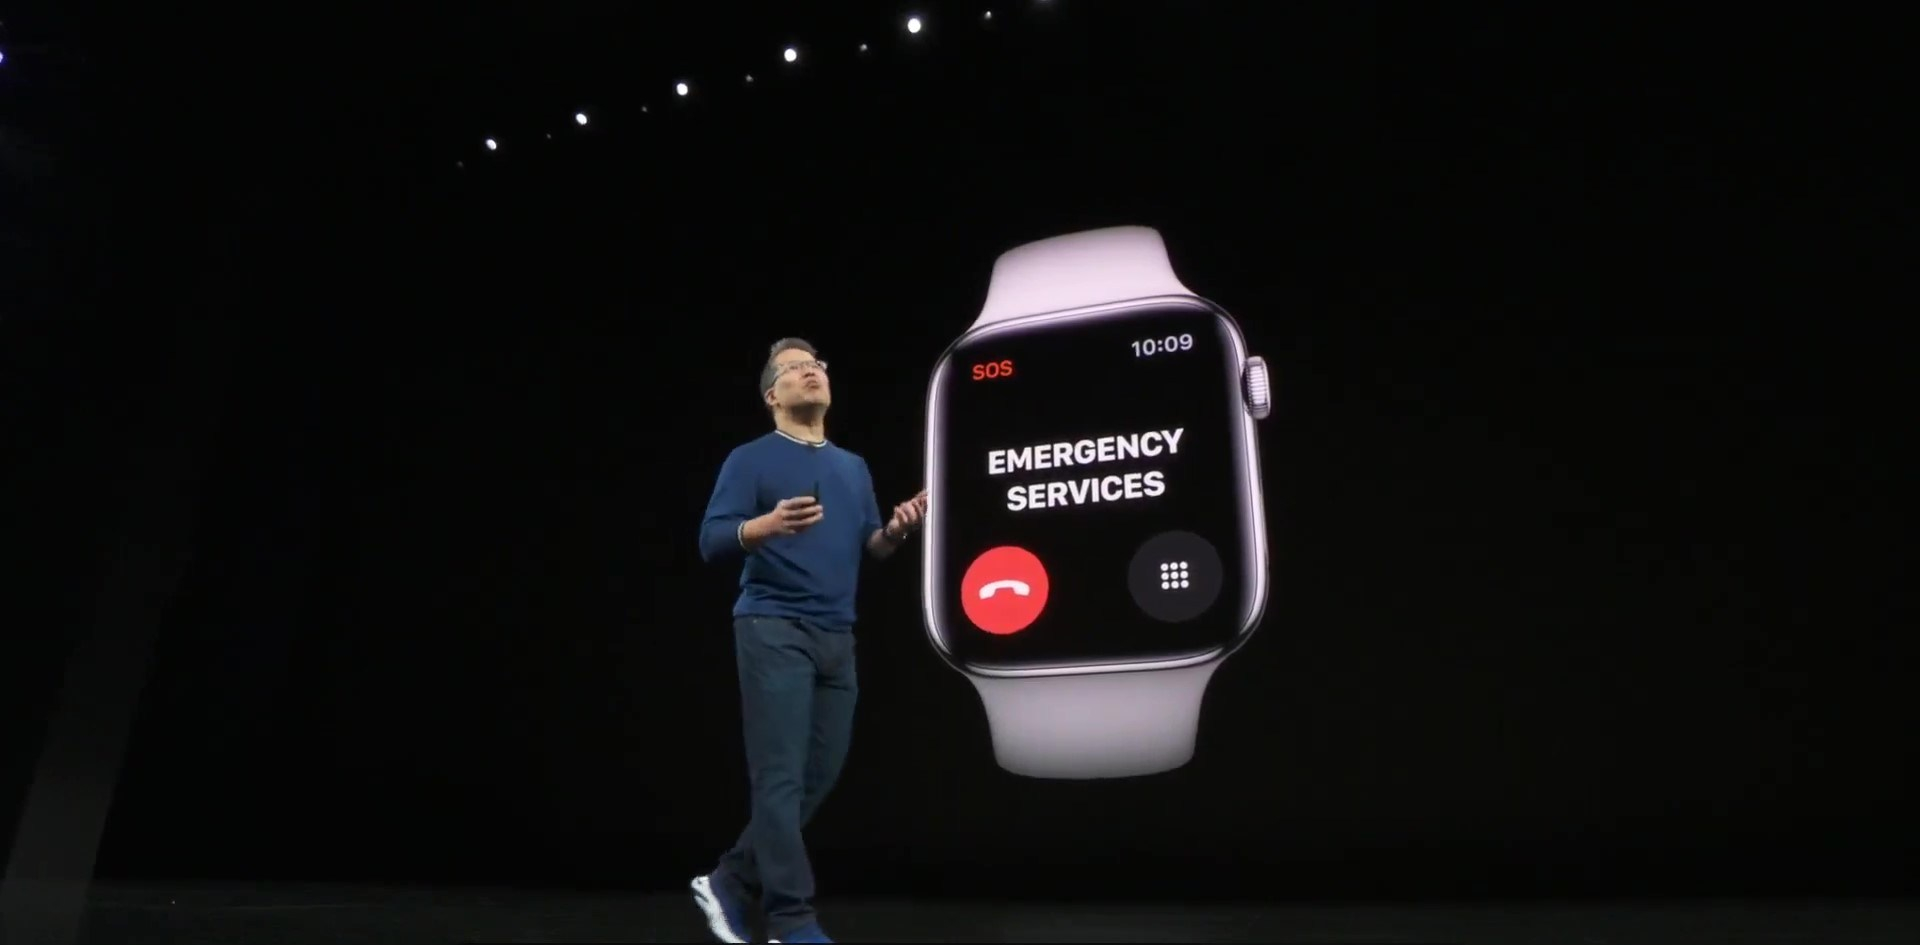 Apple Watch Series 5 支援 各國緊急電話